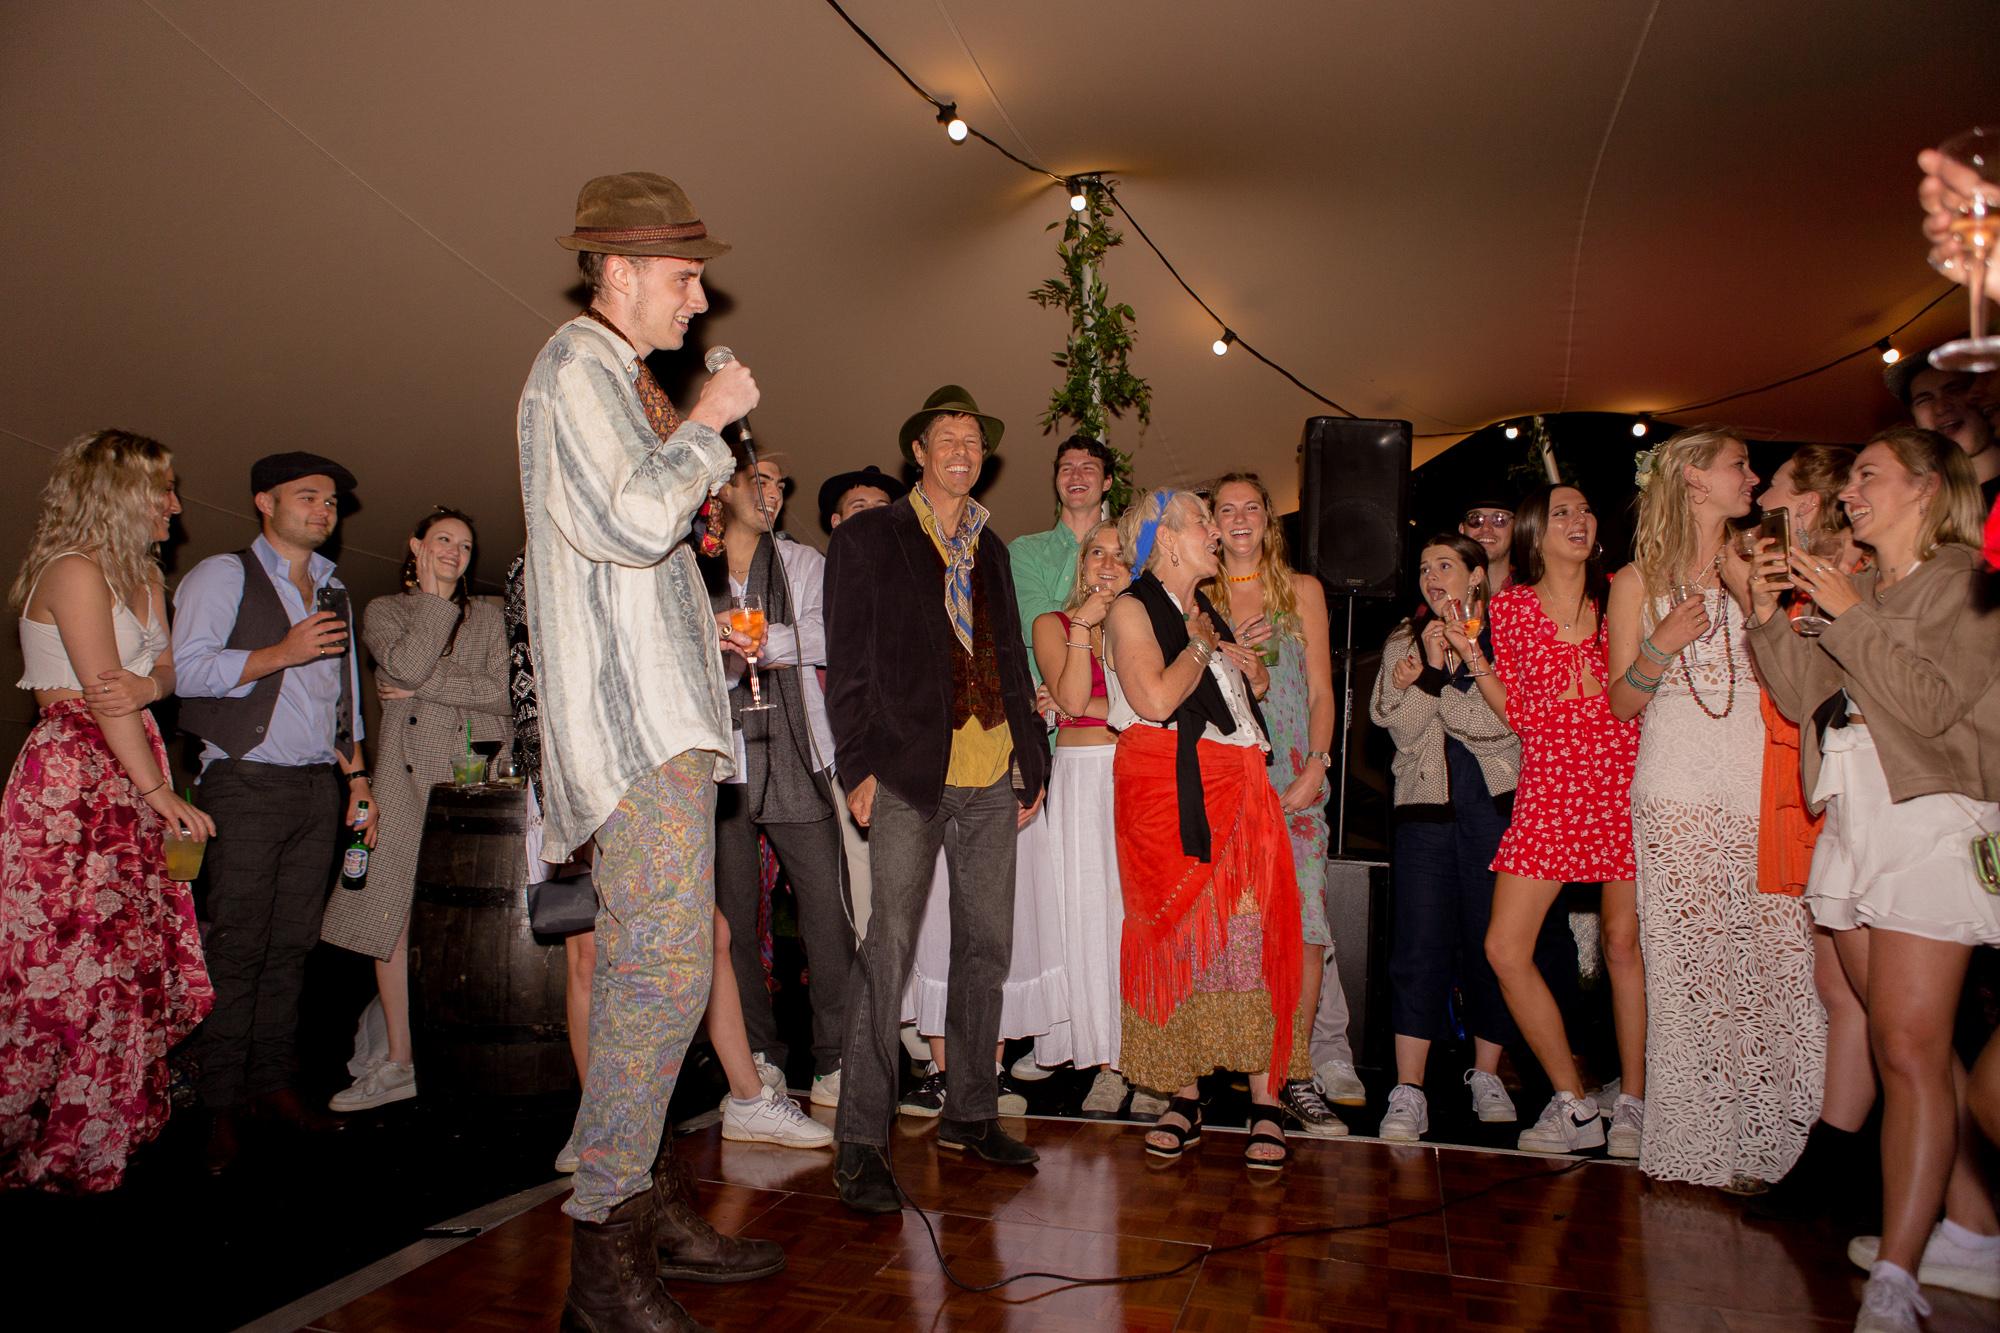 Speeches_Festival_Wedding_Inspo_wedding_photographer_Rachel_Thornhill_Photography